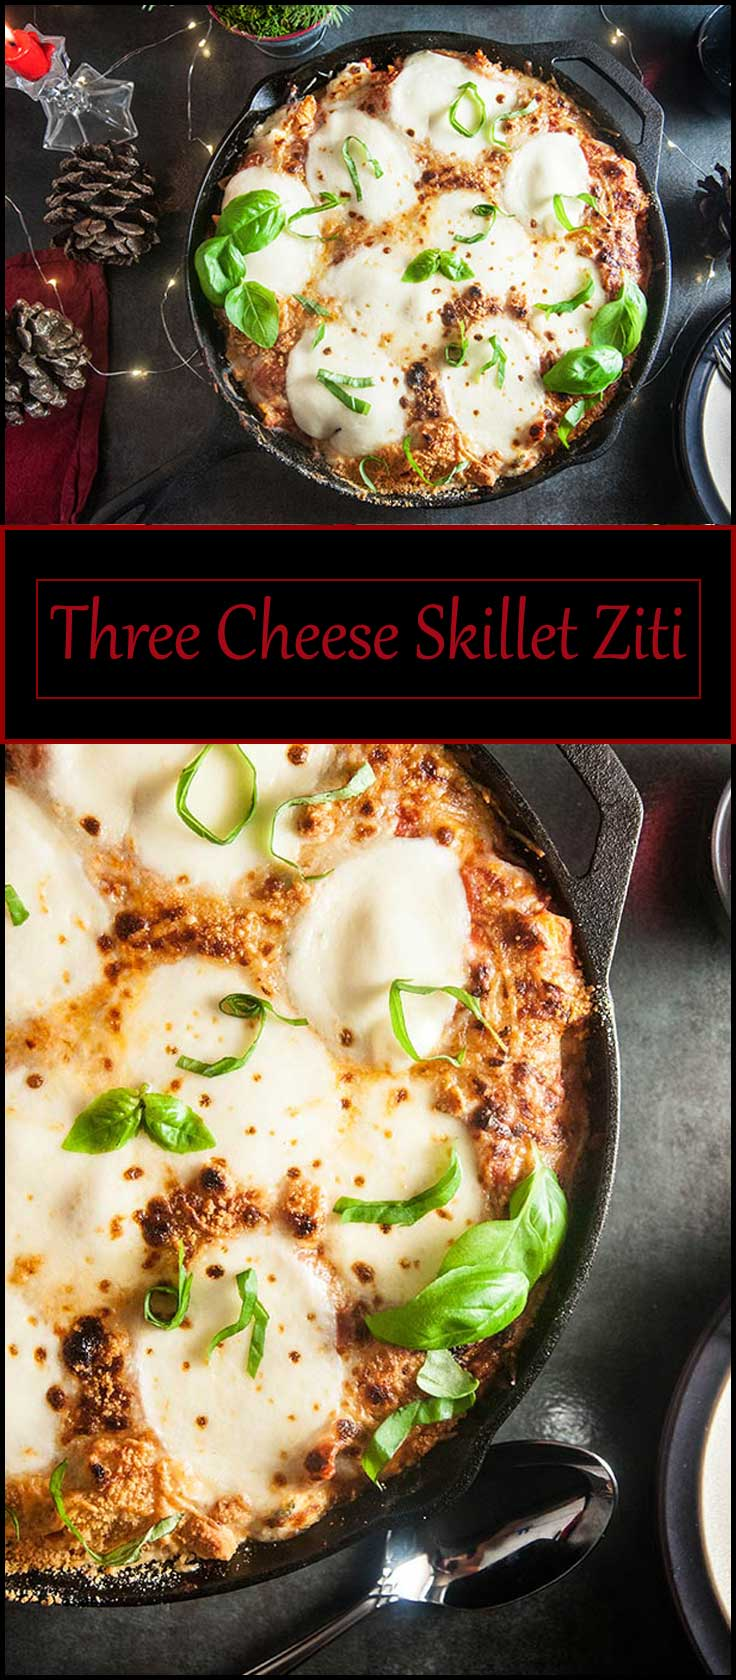 Three Cheese Skillet Ziti from www.seasonedsprinkles.com